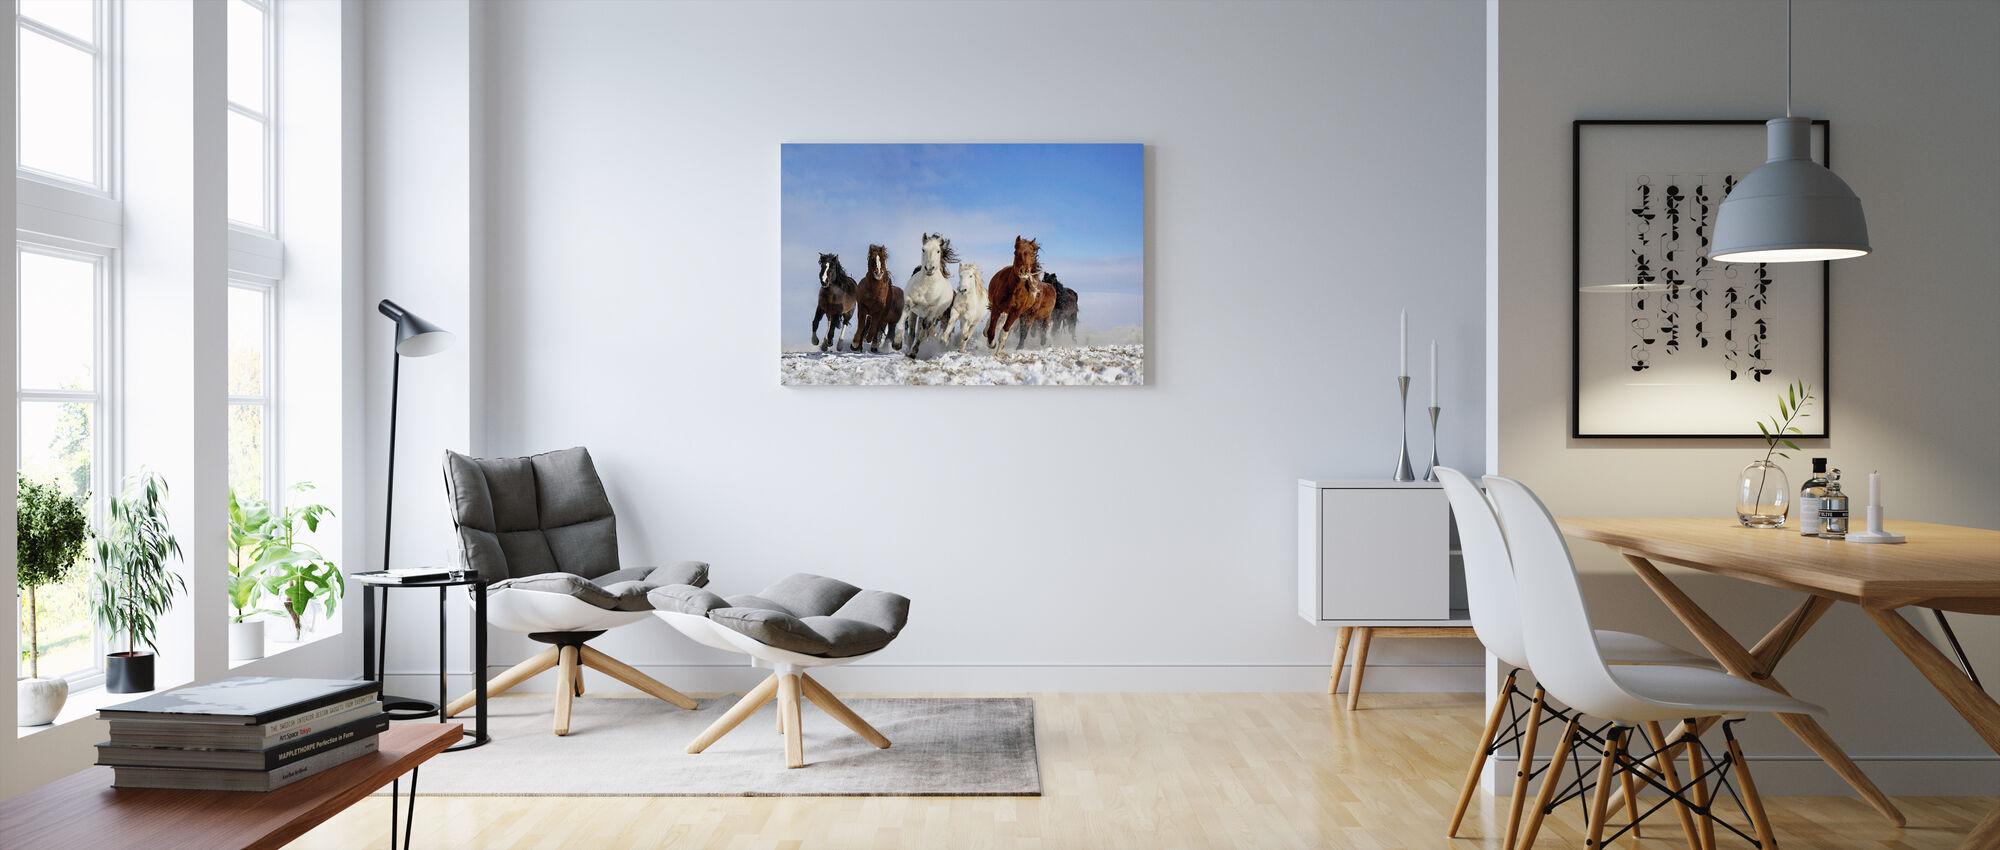 Mongoliet Hästar - Canvastavla - Vardagsrum